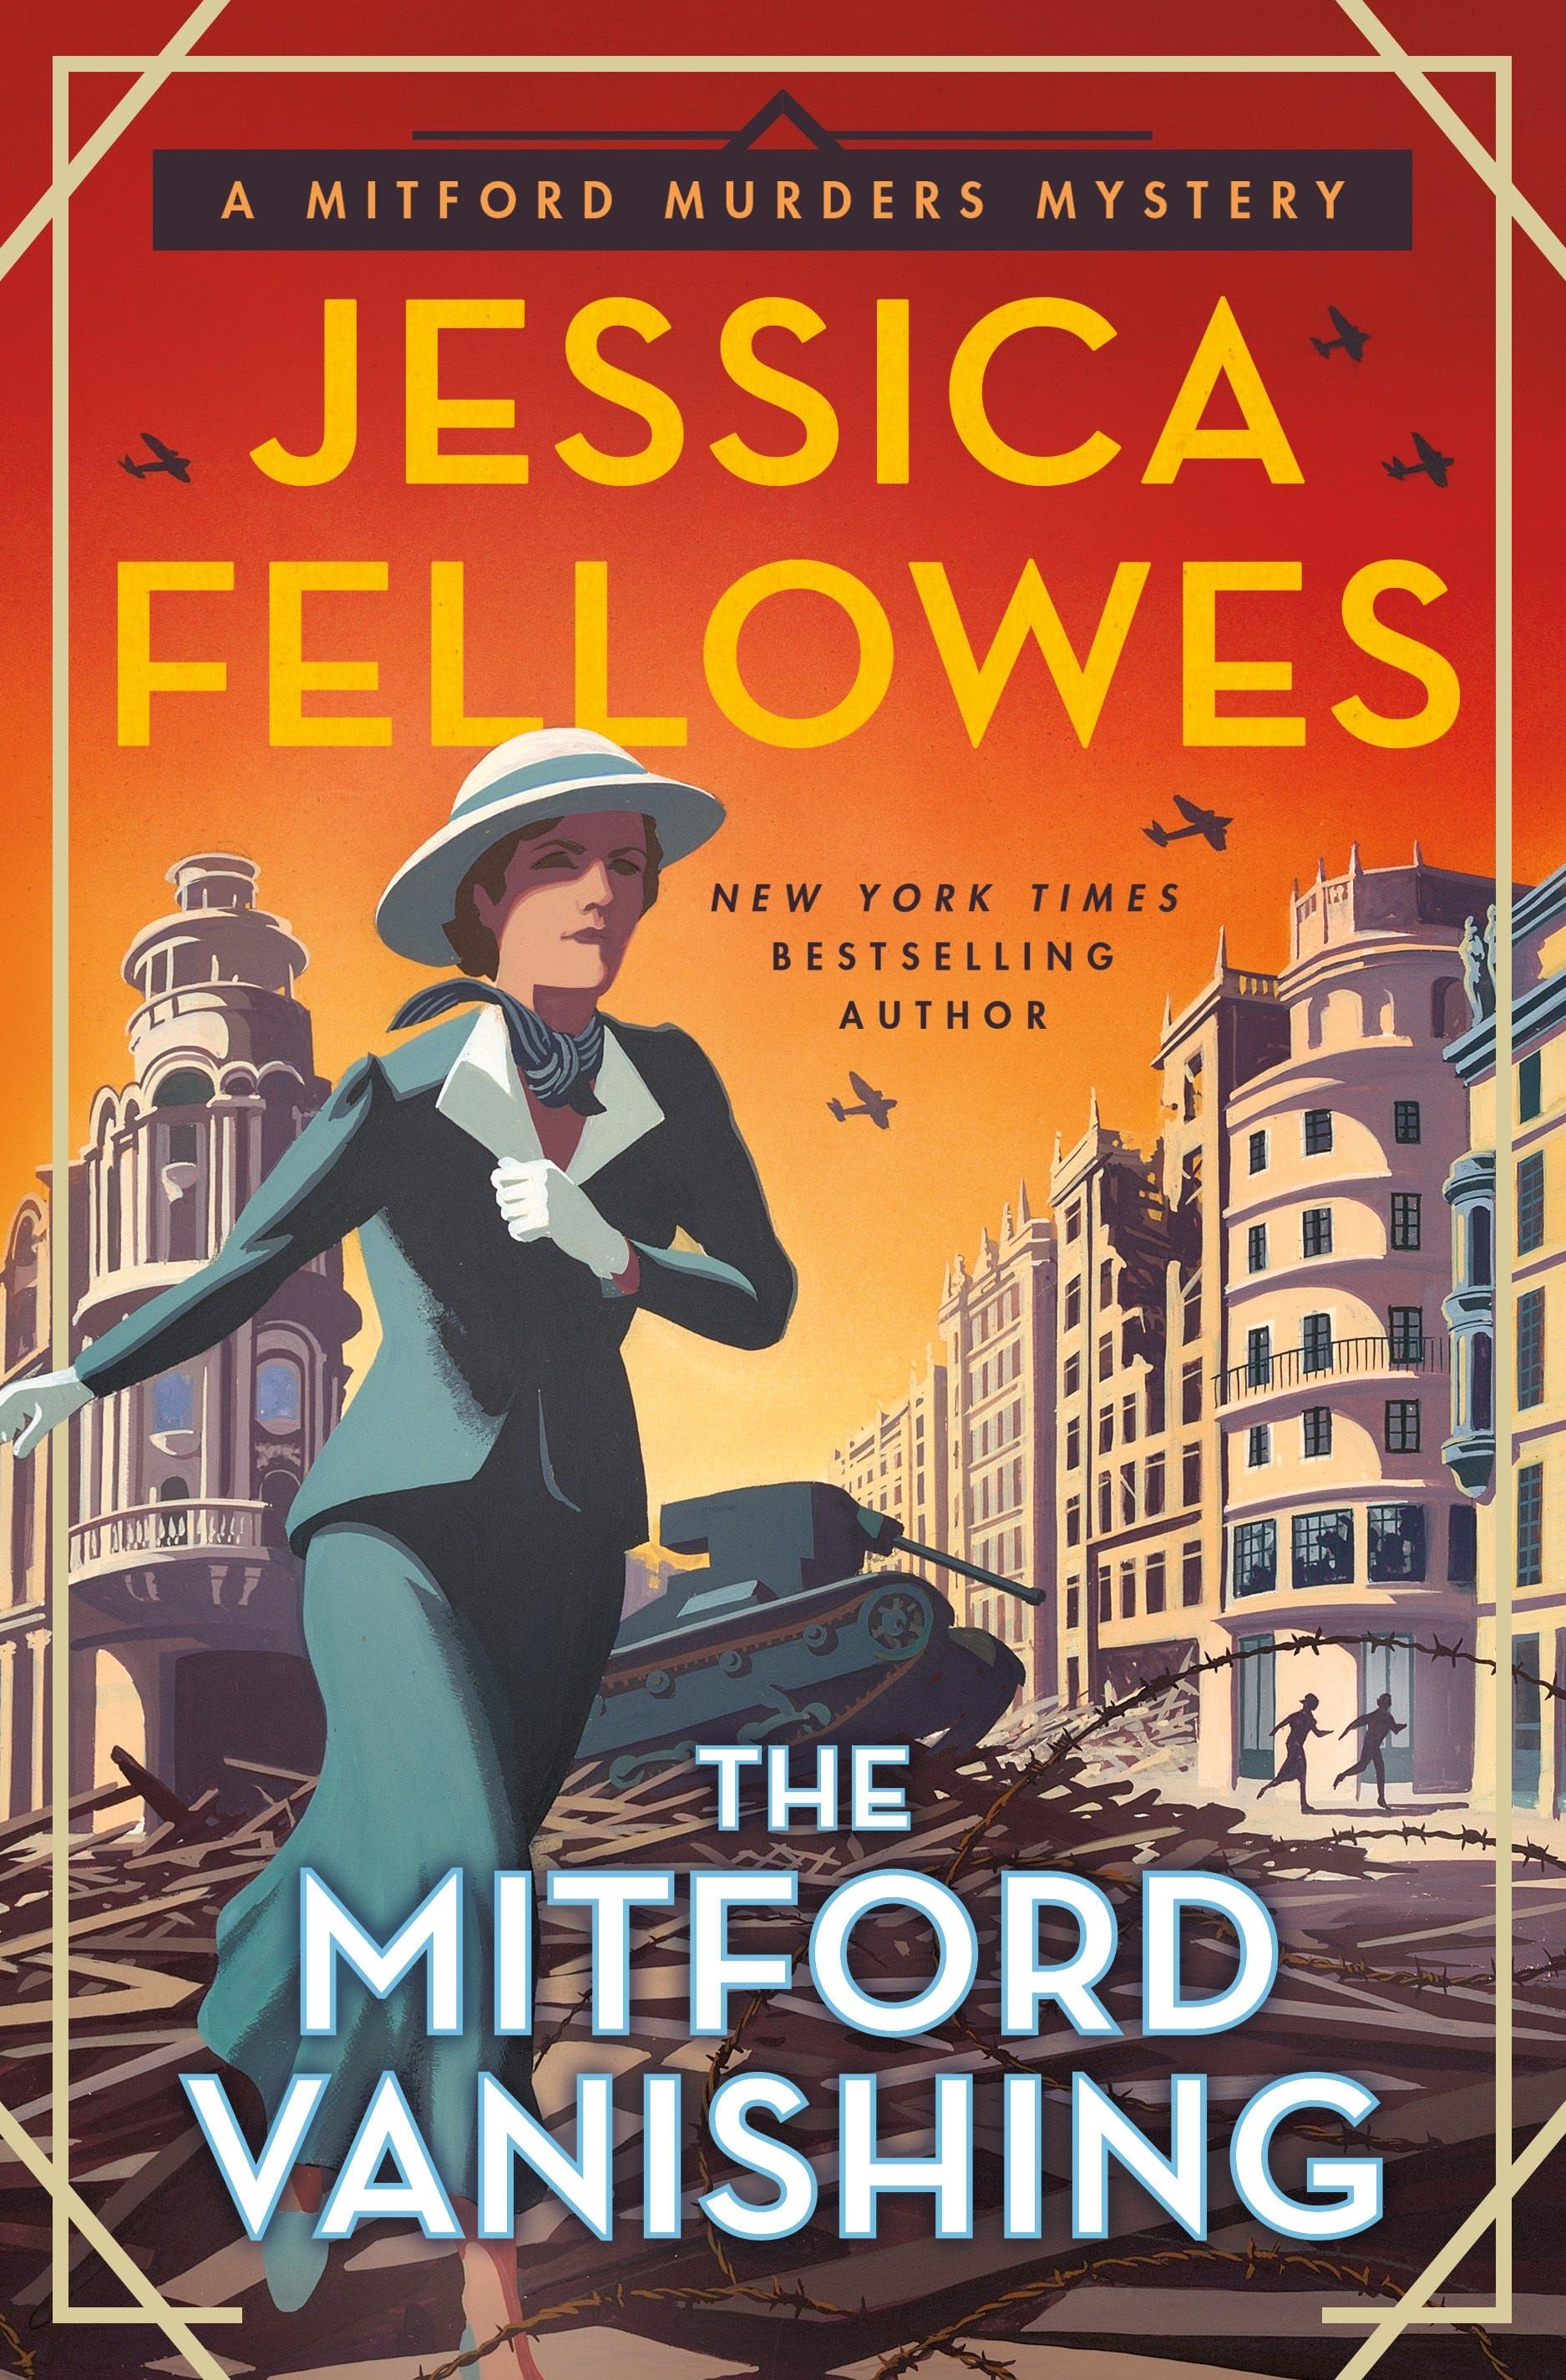 Image of The Mitford Vanishing